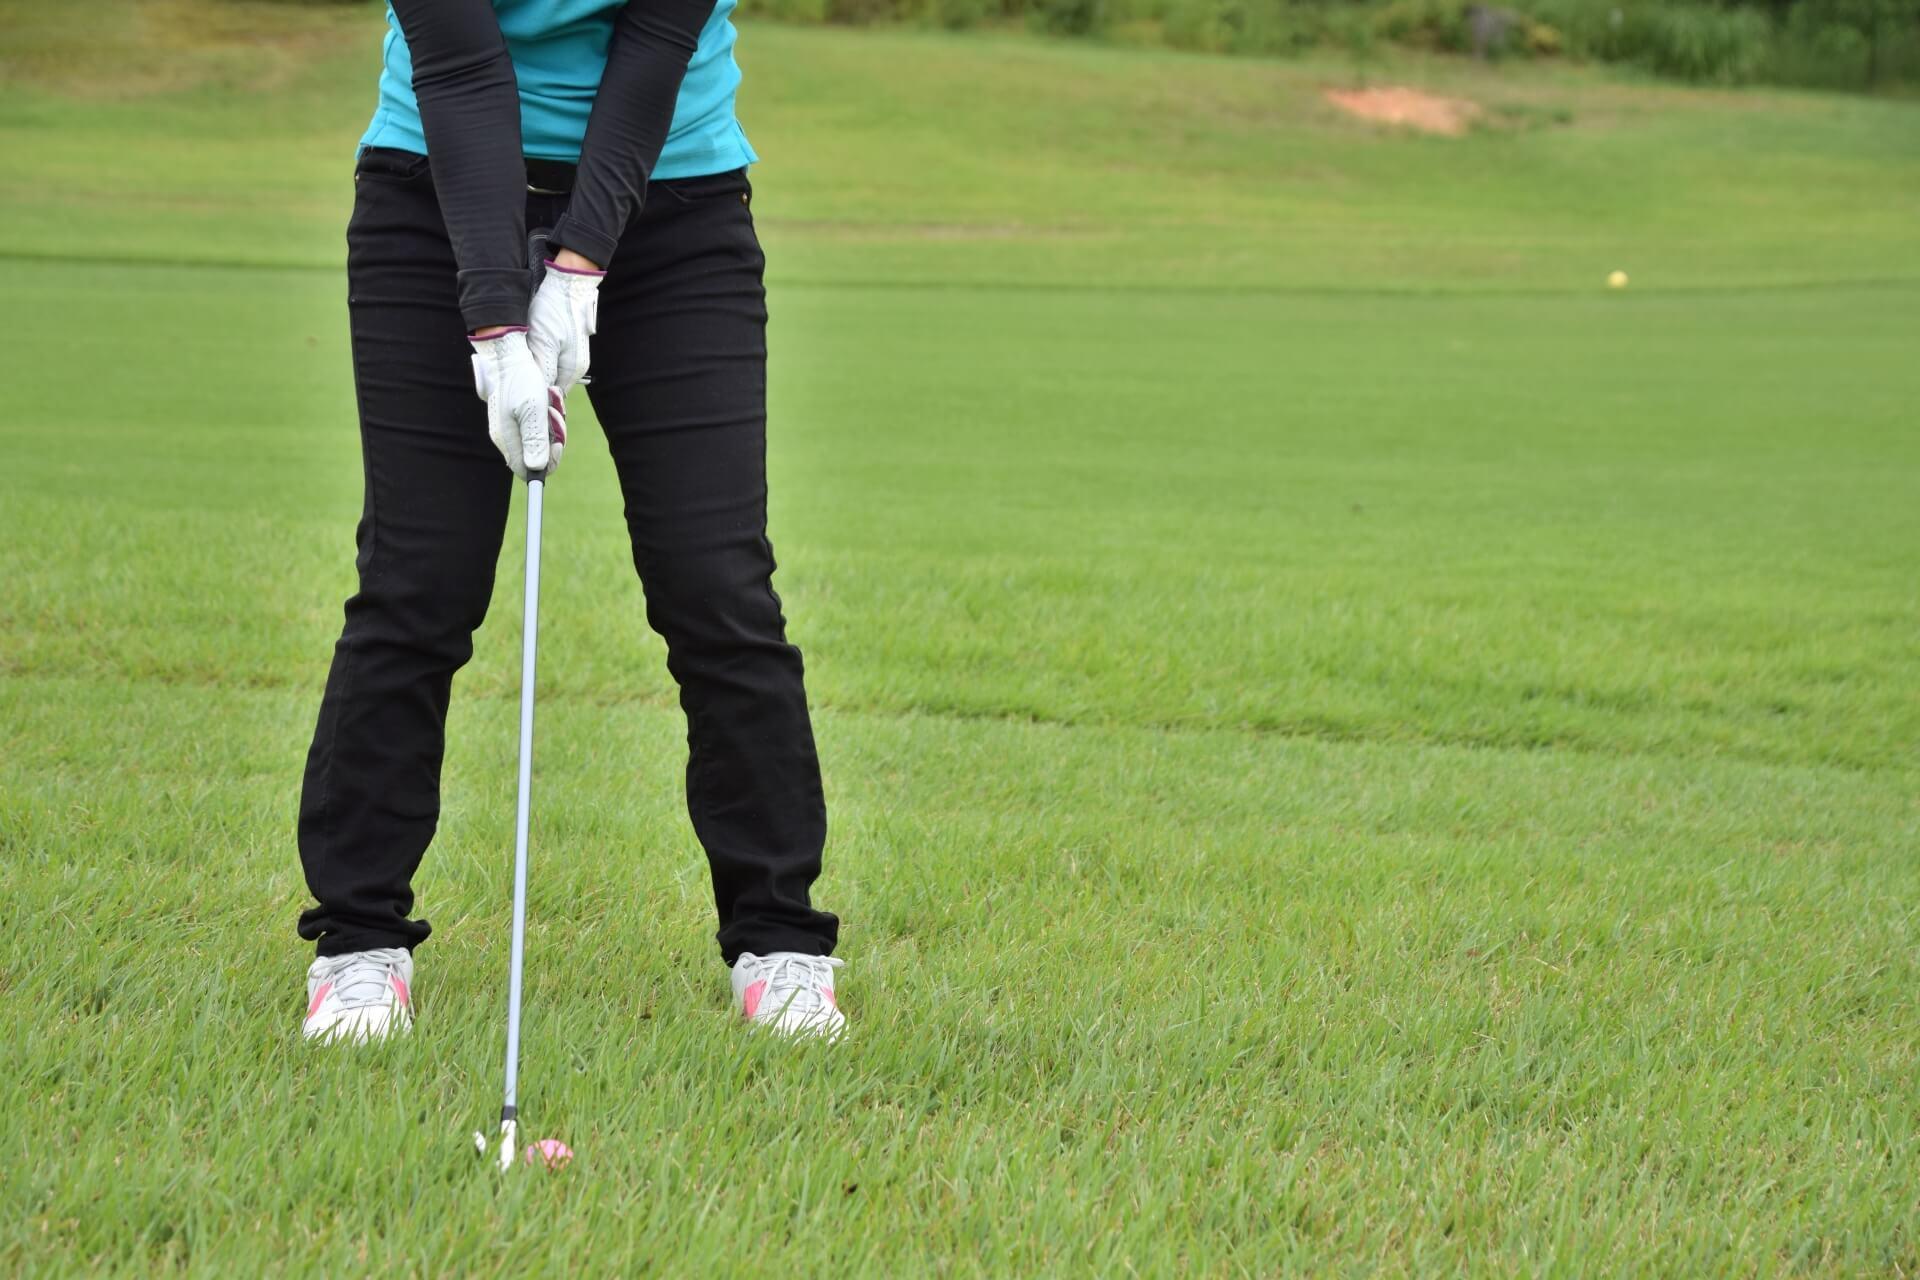 2e3cbb9055a7f ゴルフにジャケットはマストアイテム!?巻き起こる賛否両論とは ...